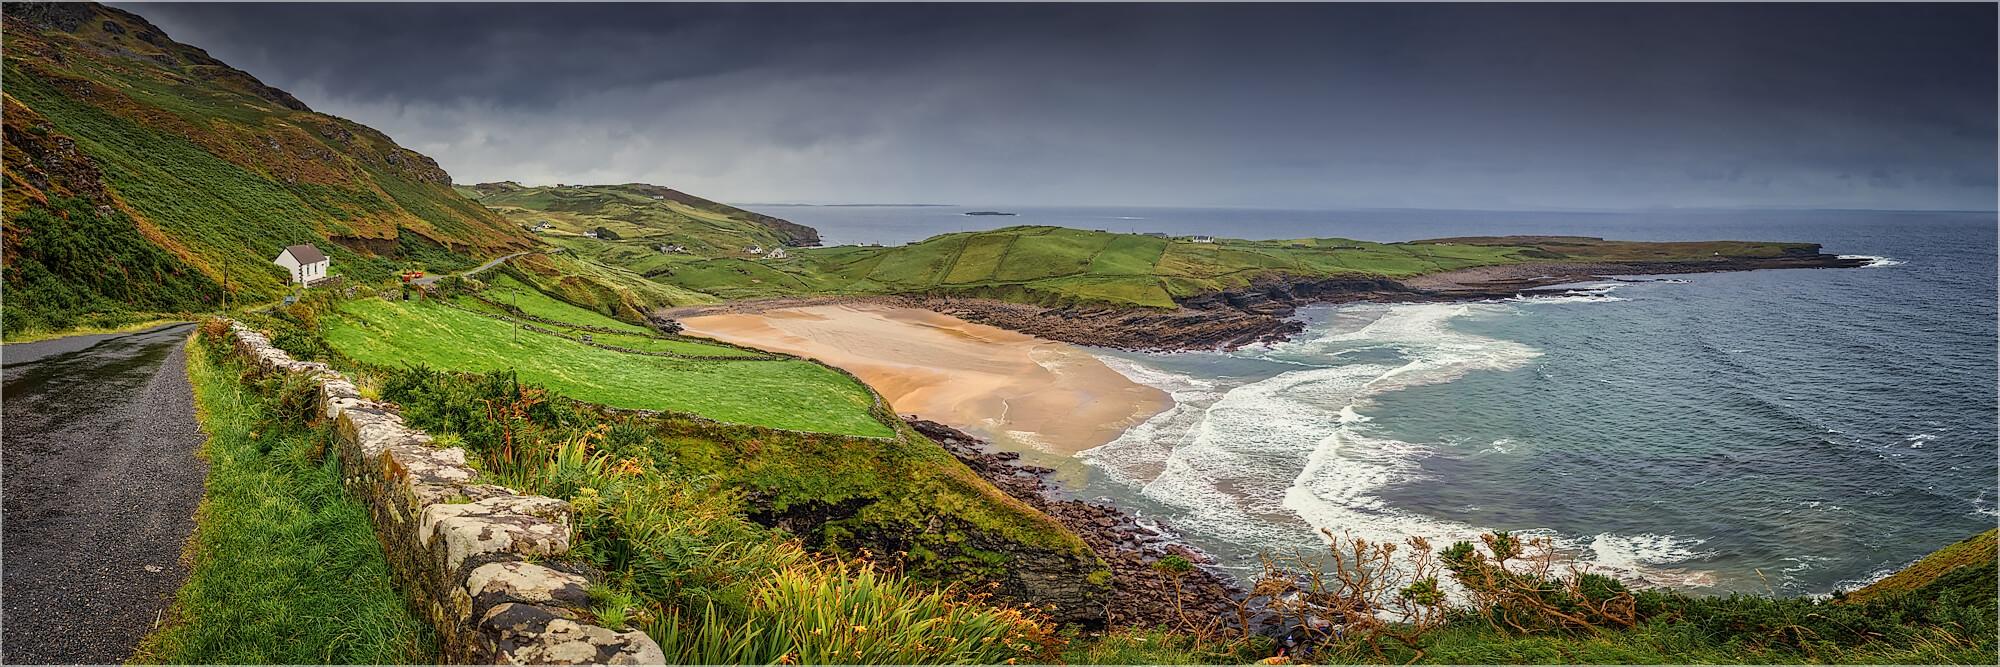 Panoramabild Küstenlandschaft Wild Atlantik Way Irland